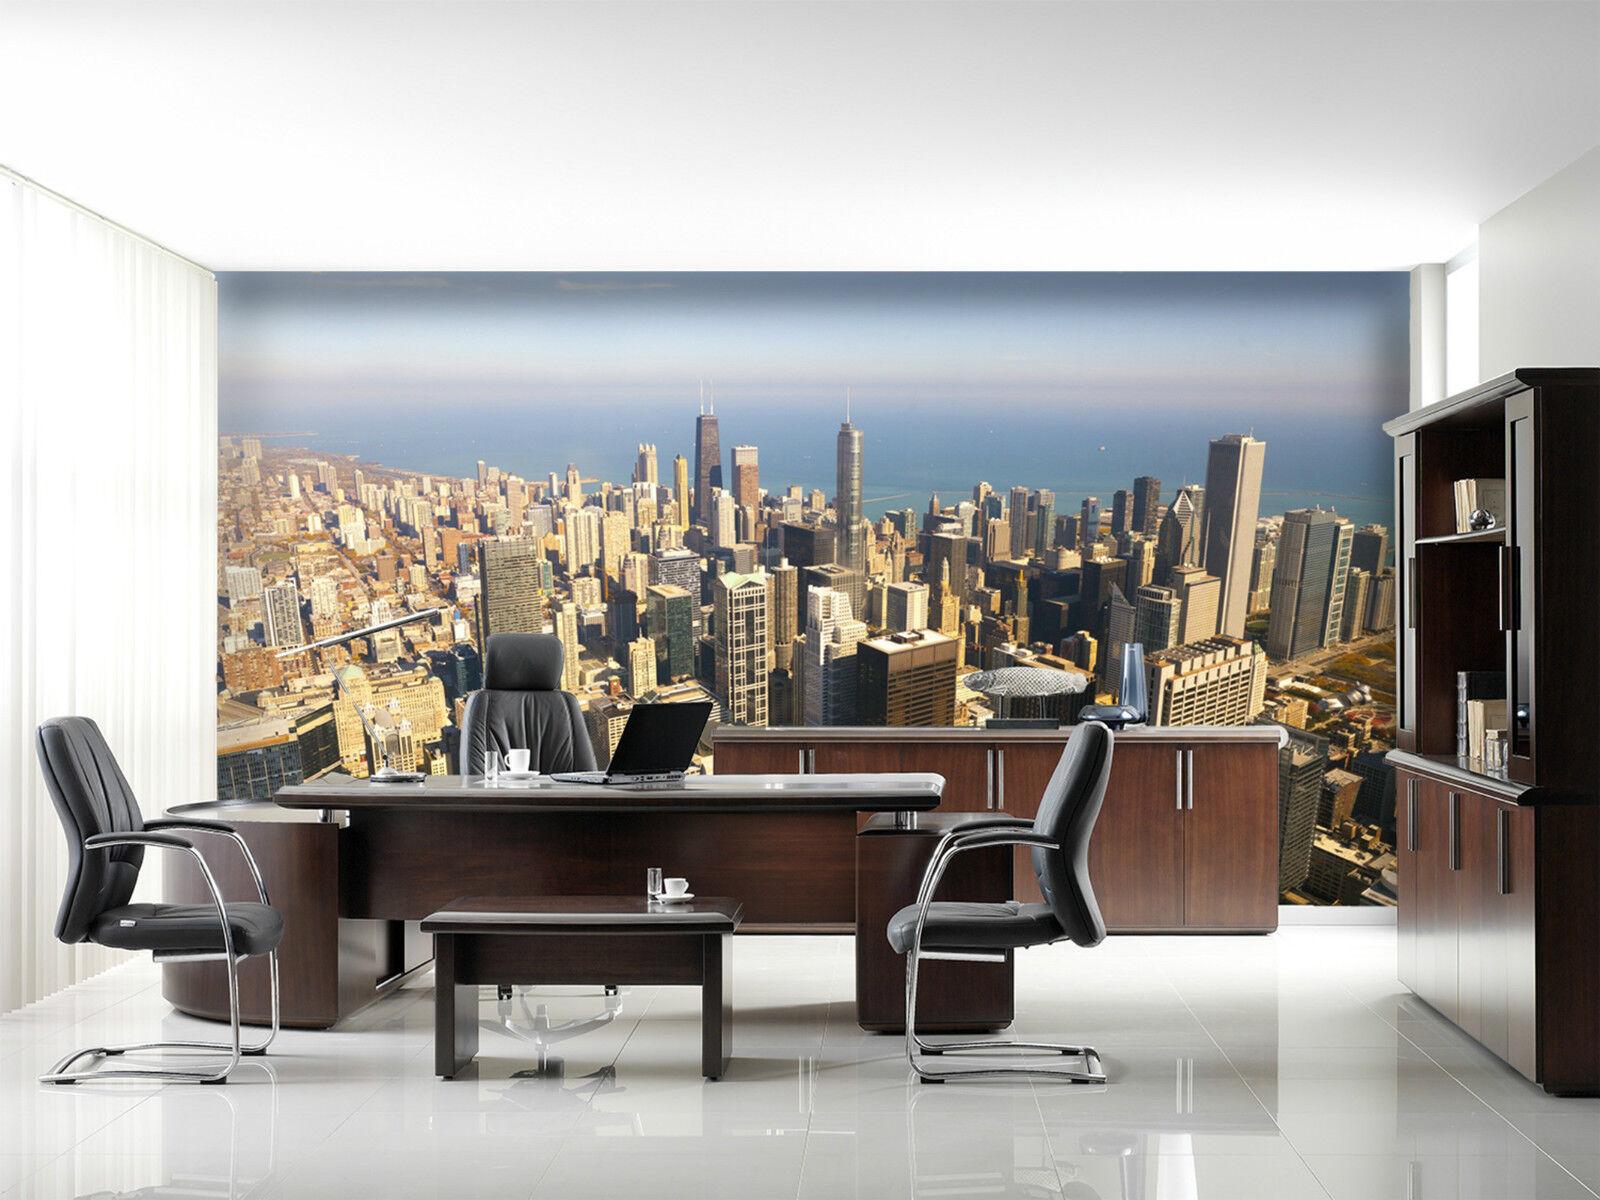 3D Hochhaus 432 Fototapeten Wandbild Fototapete Bild Tapete Familie Kinder DE